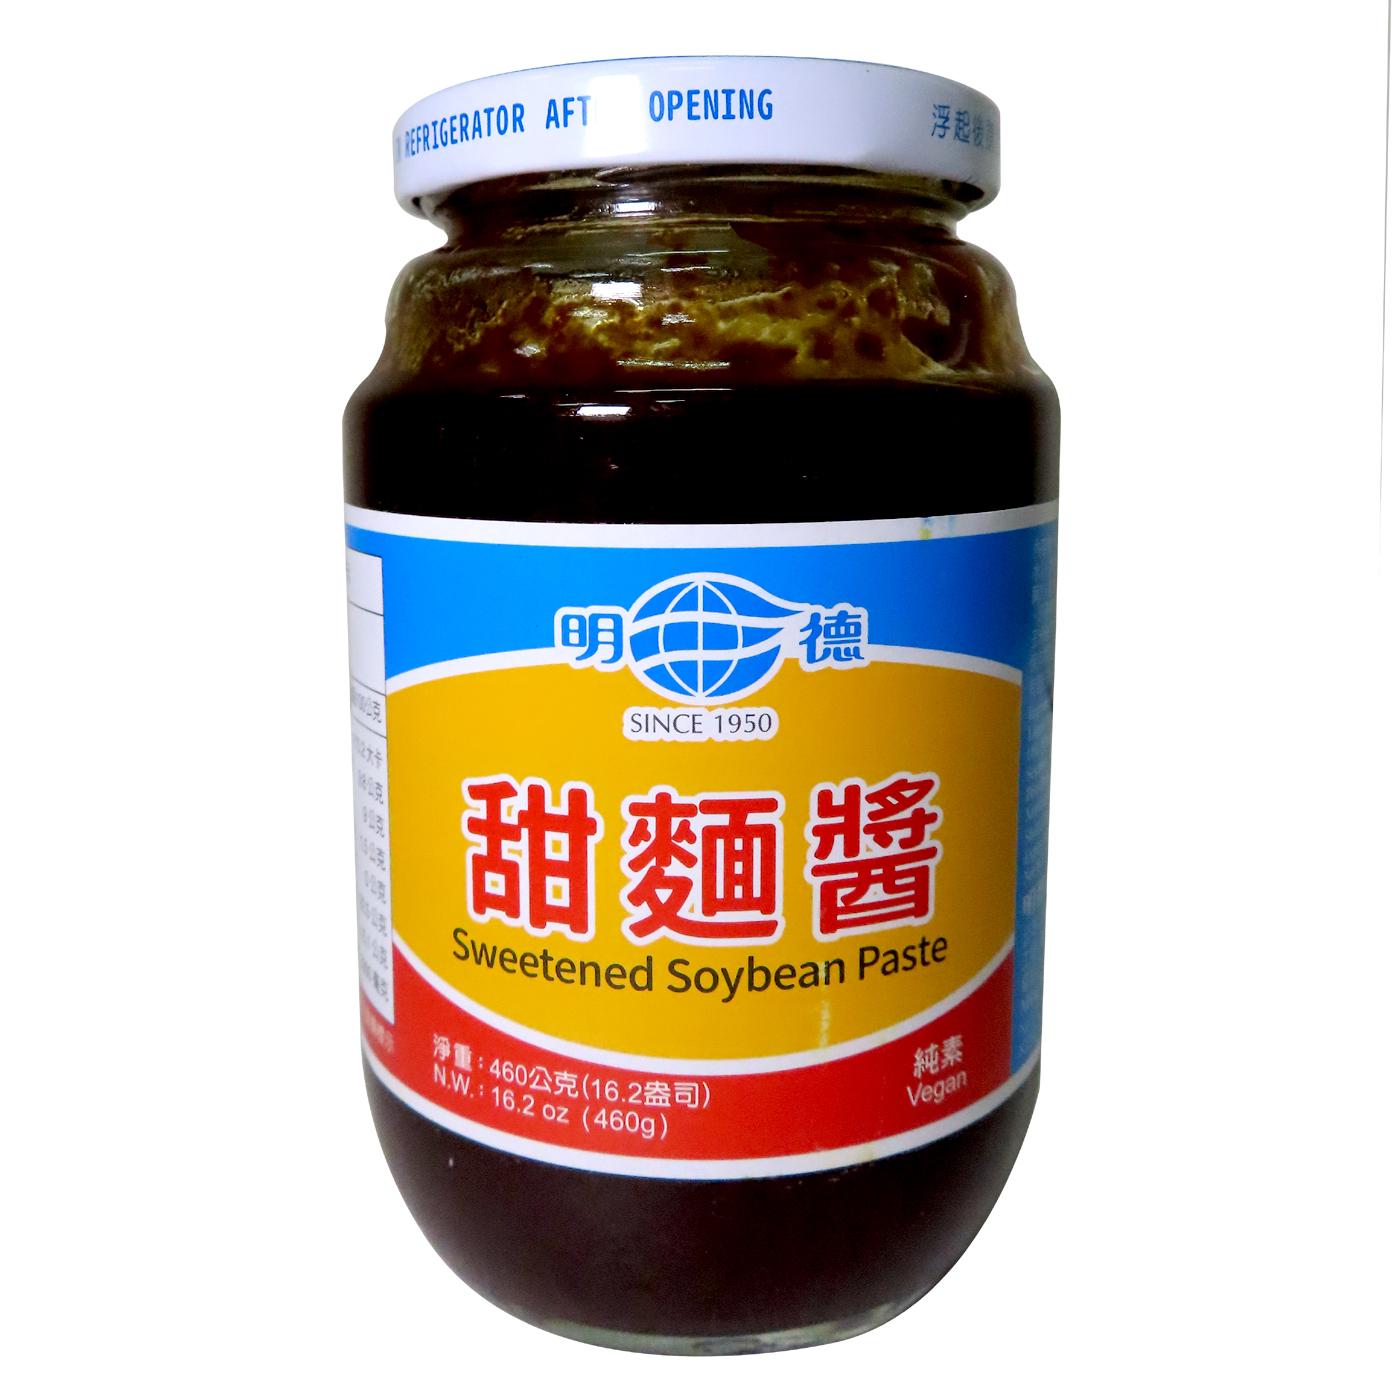 Image Sweetened Soybean Paste 明德 - 甜面酱 460grams